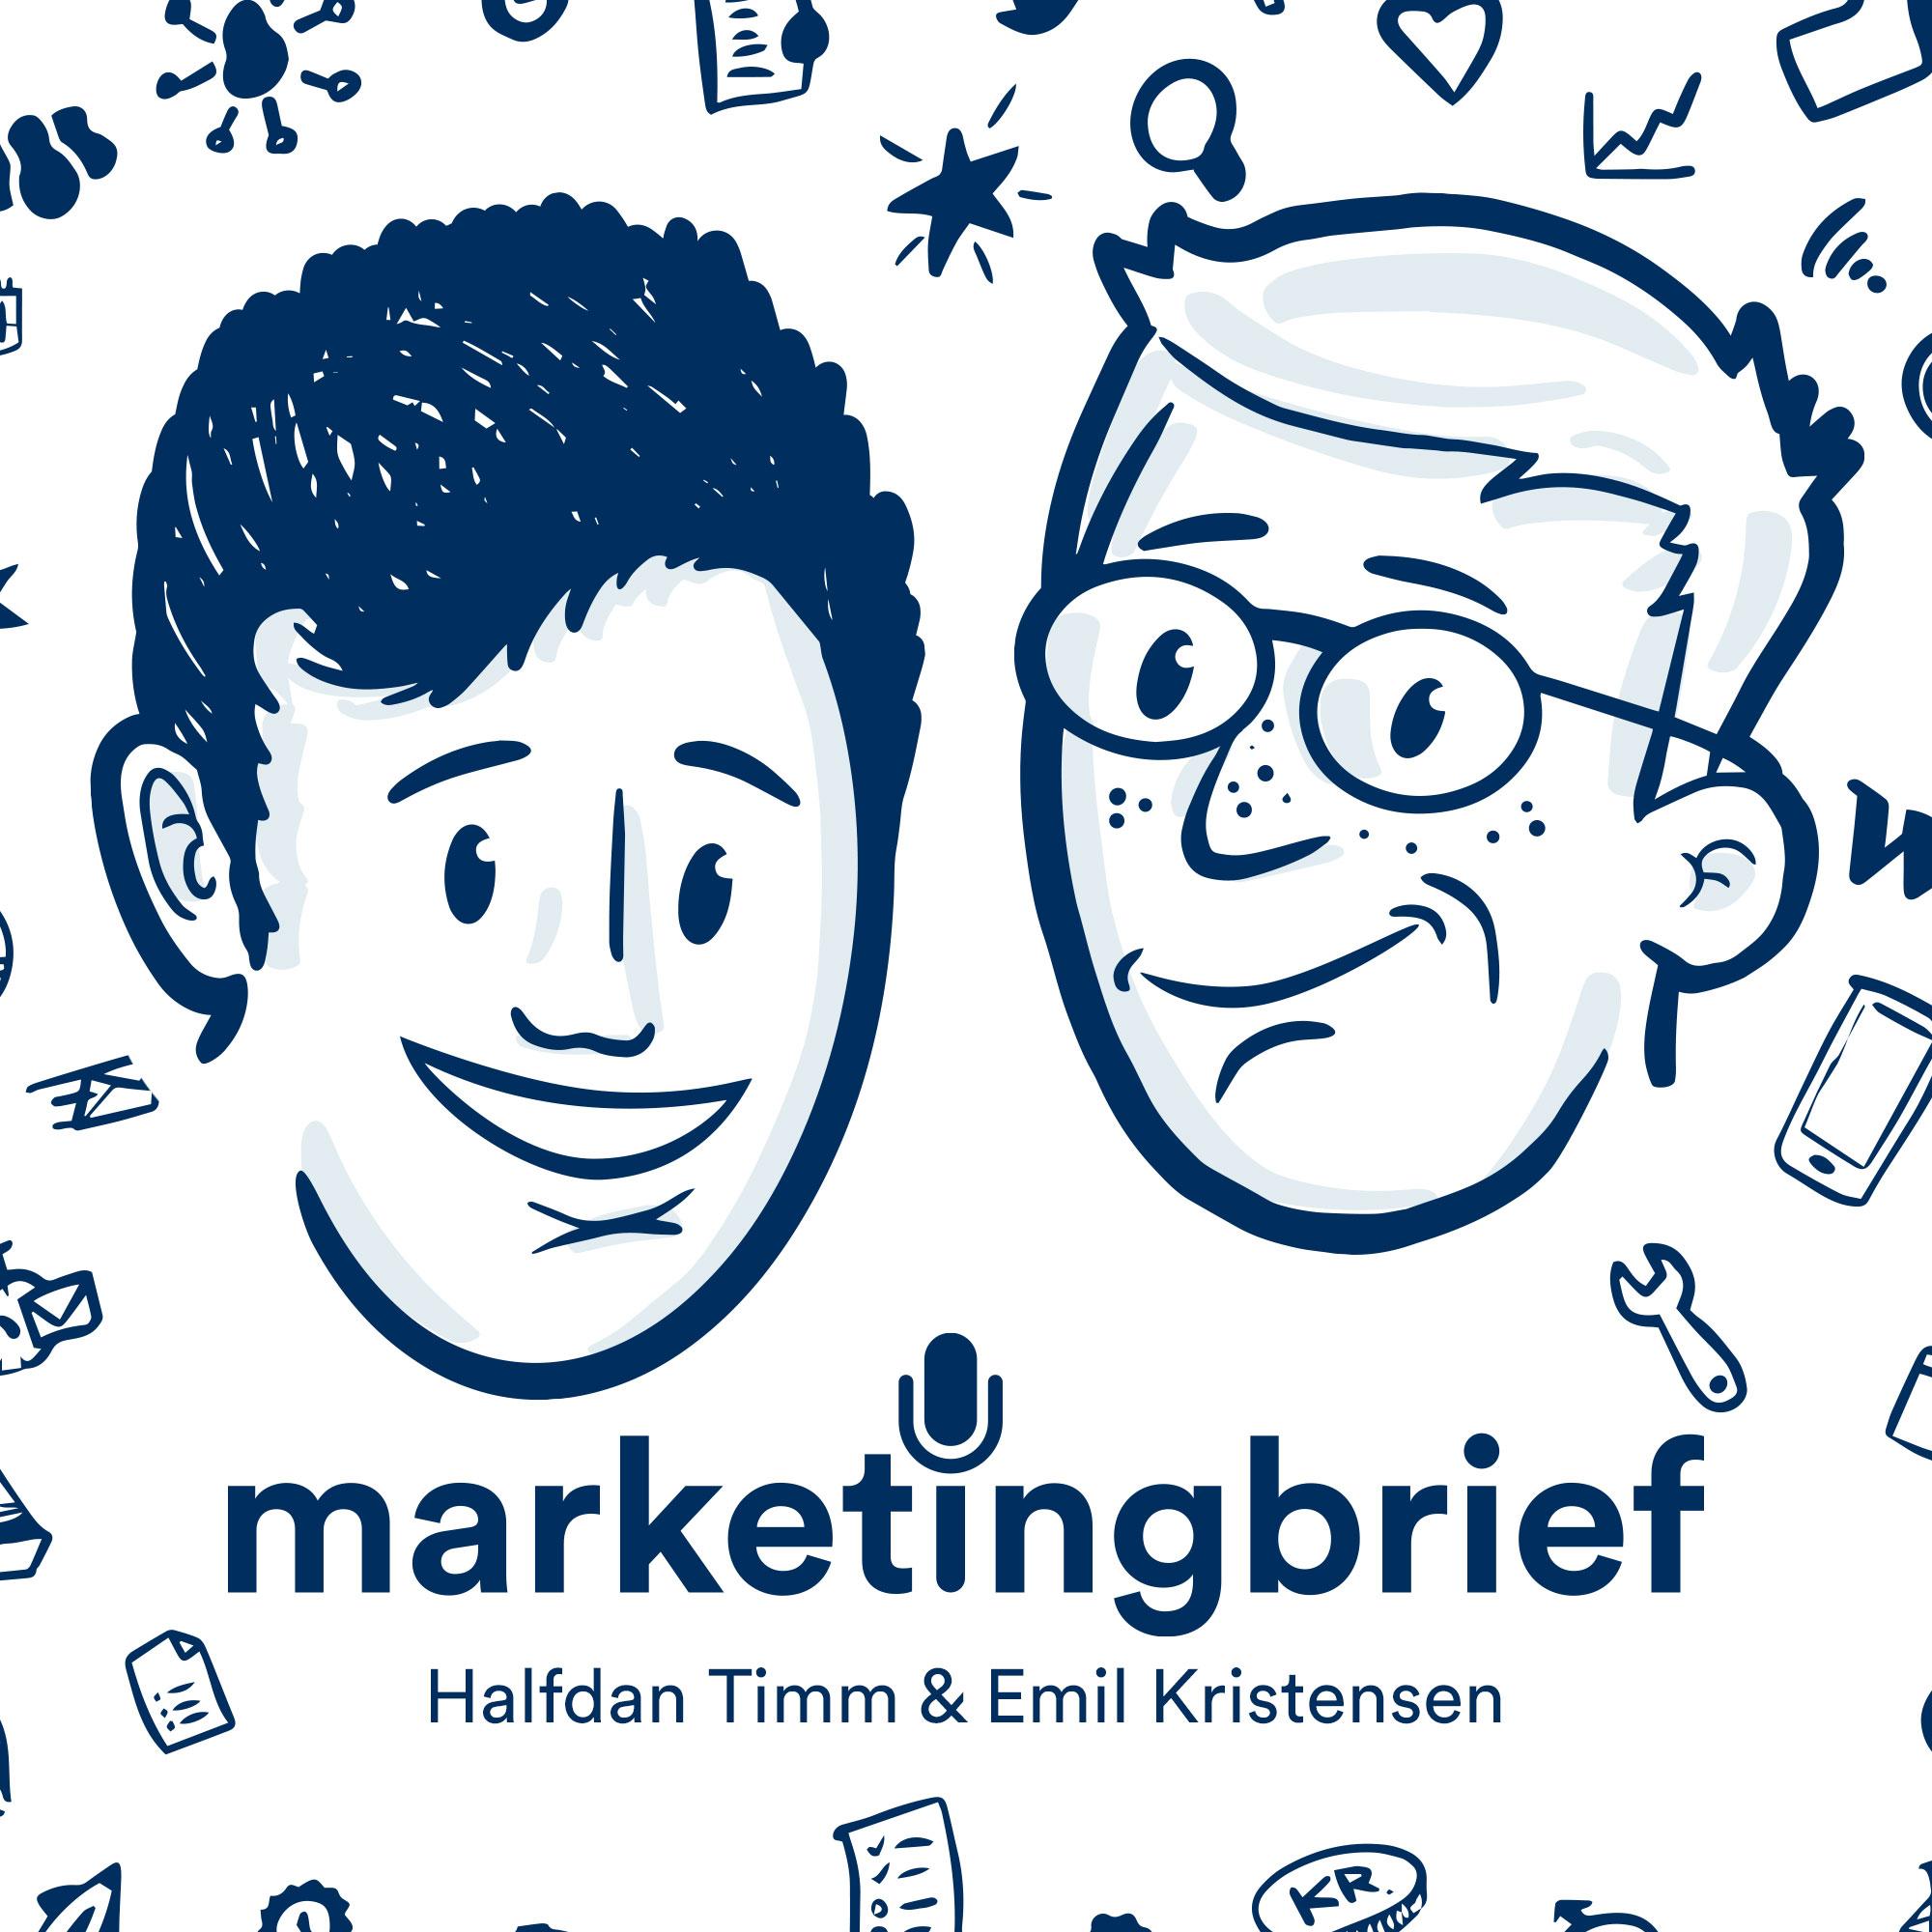 Marketing Brief - Et podcast om Online Marketing show art